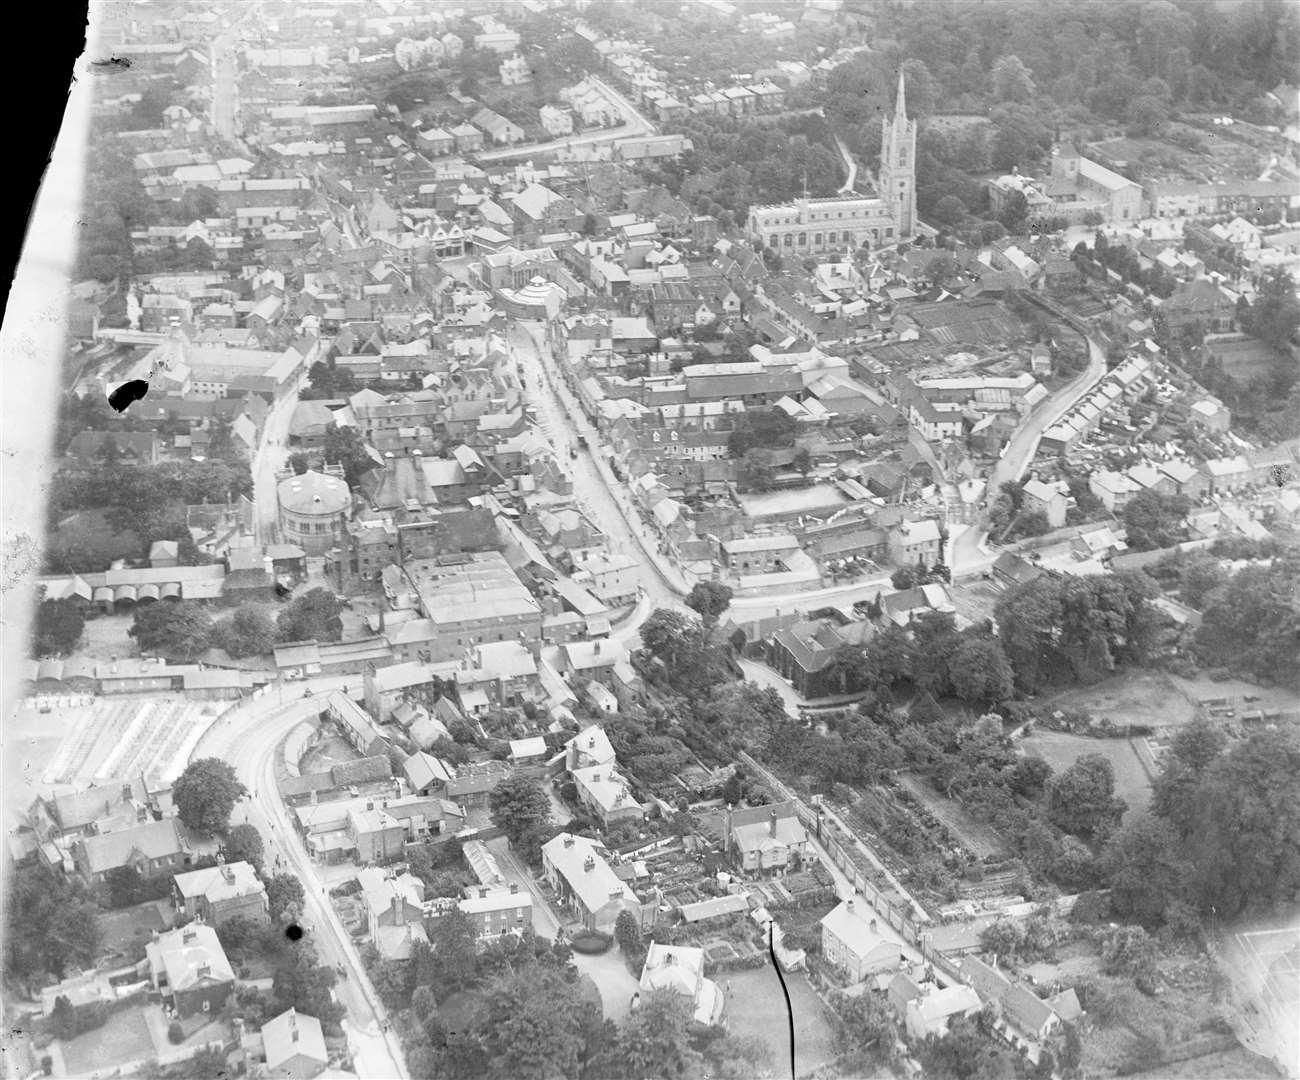 Bishop's Stortford town centre in 1920 Credit: Historic England